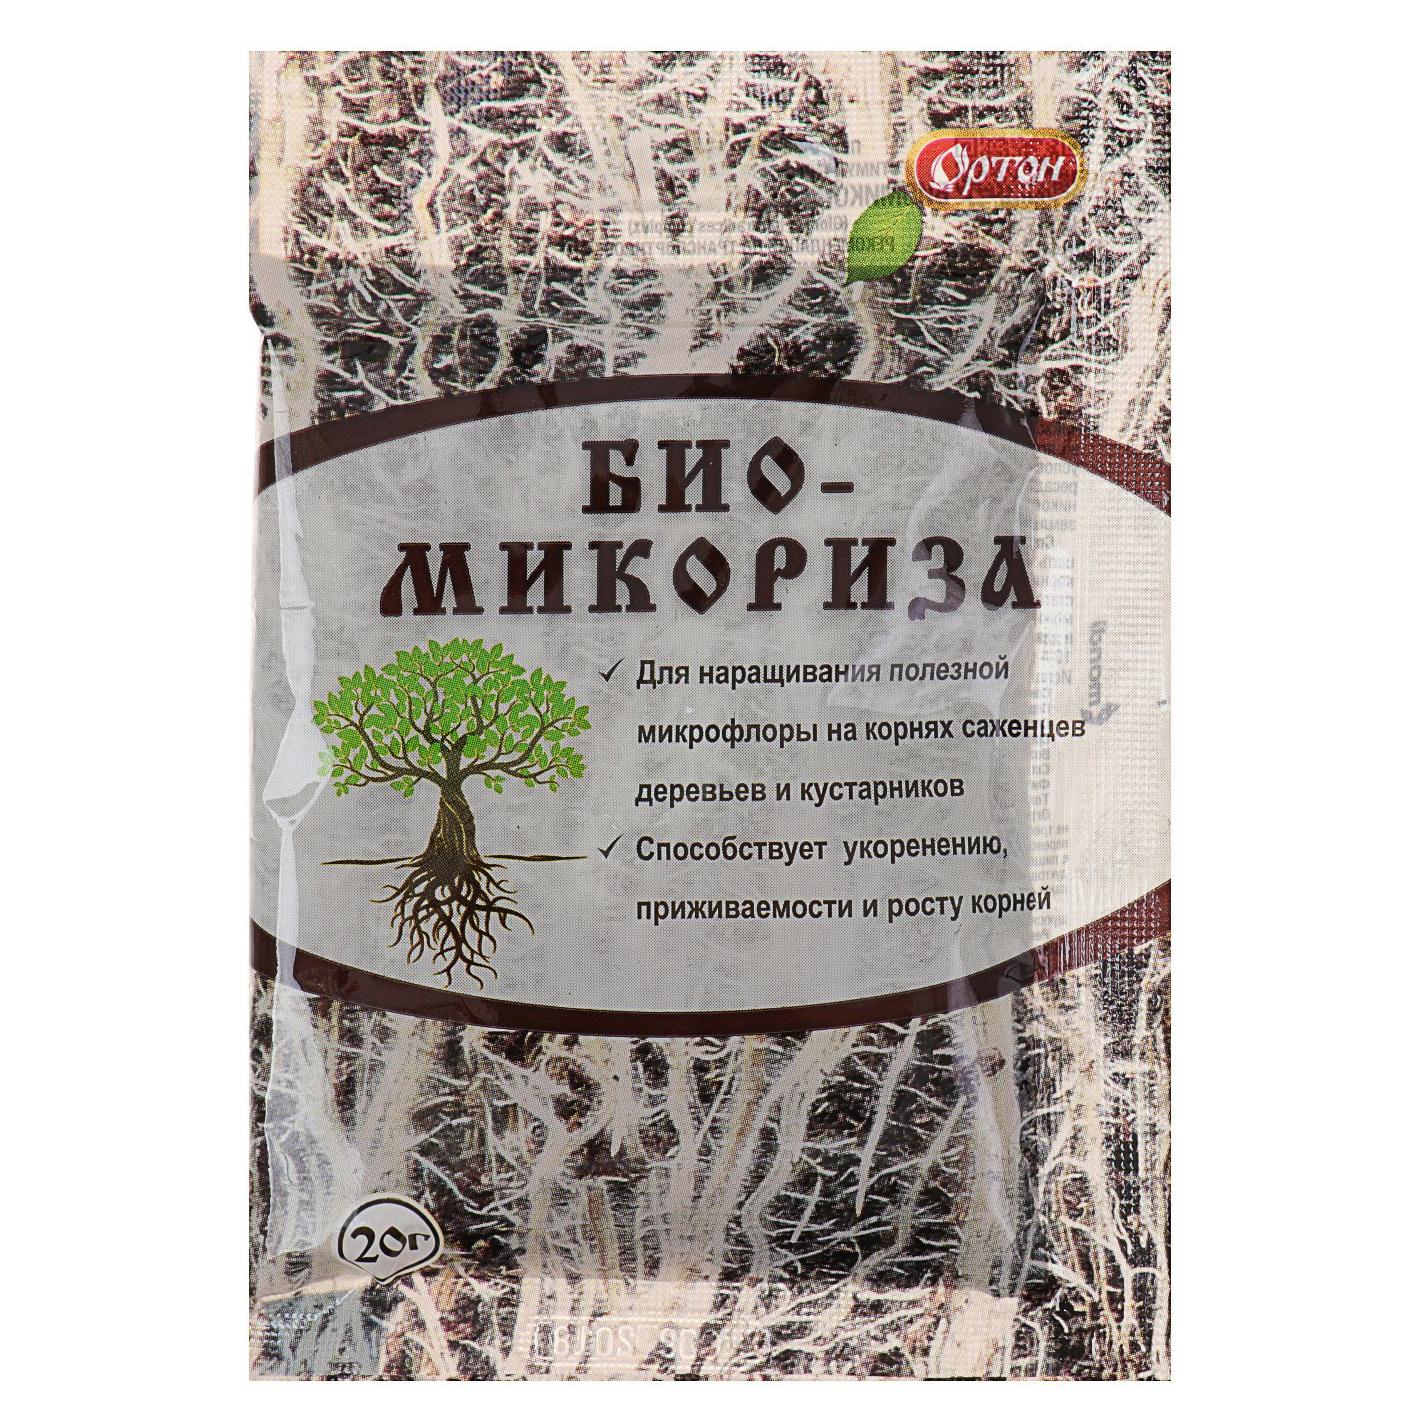 Фитогормон для корнеобразования плодовитости Ортон Биомикориза 220326 002 кг.